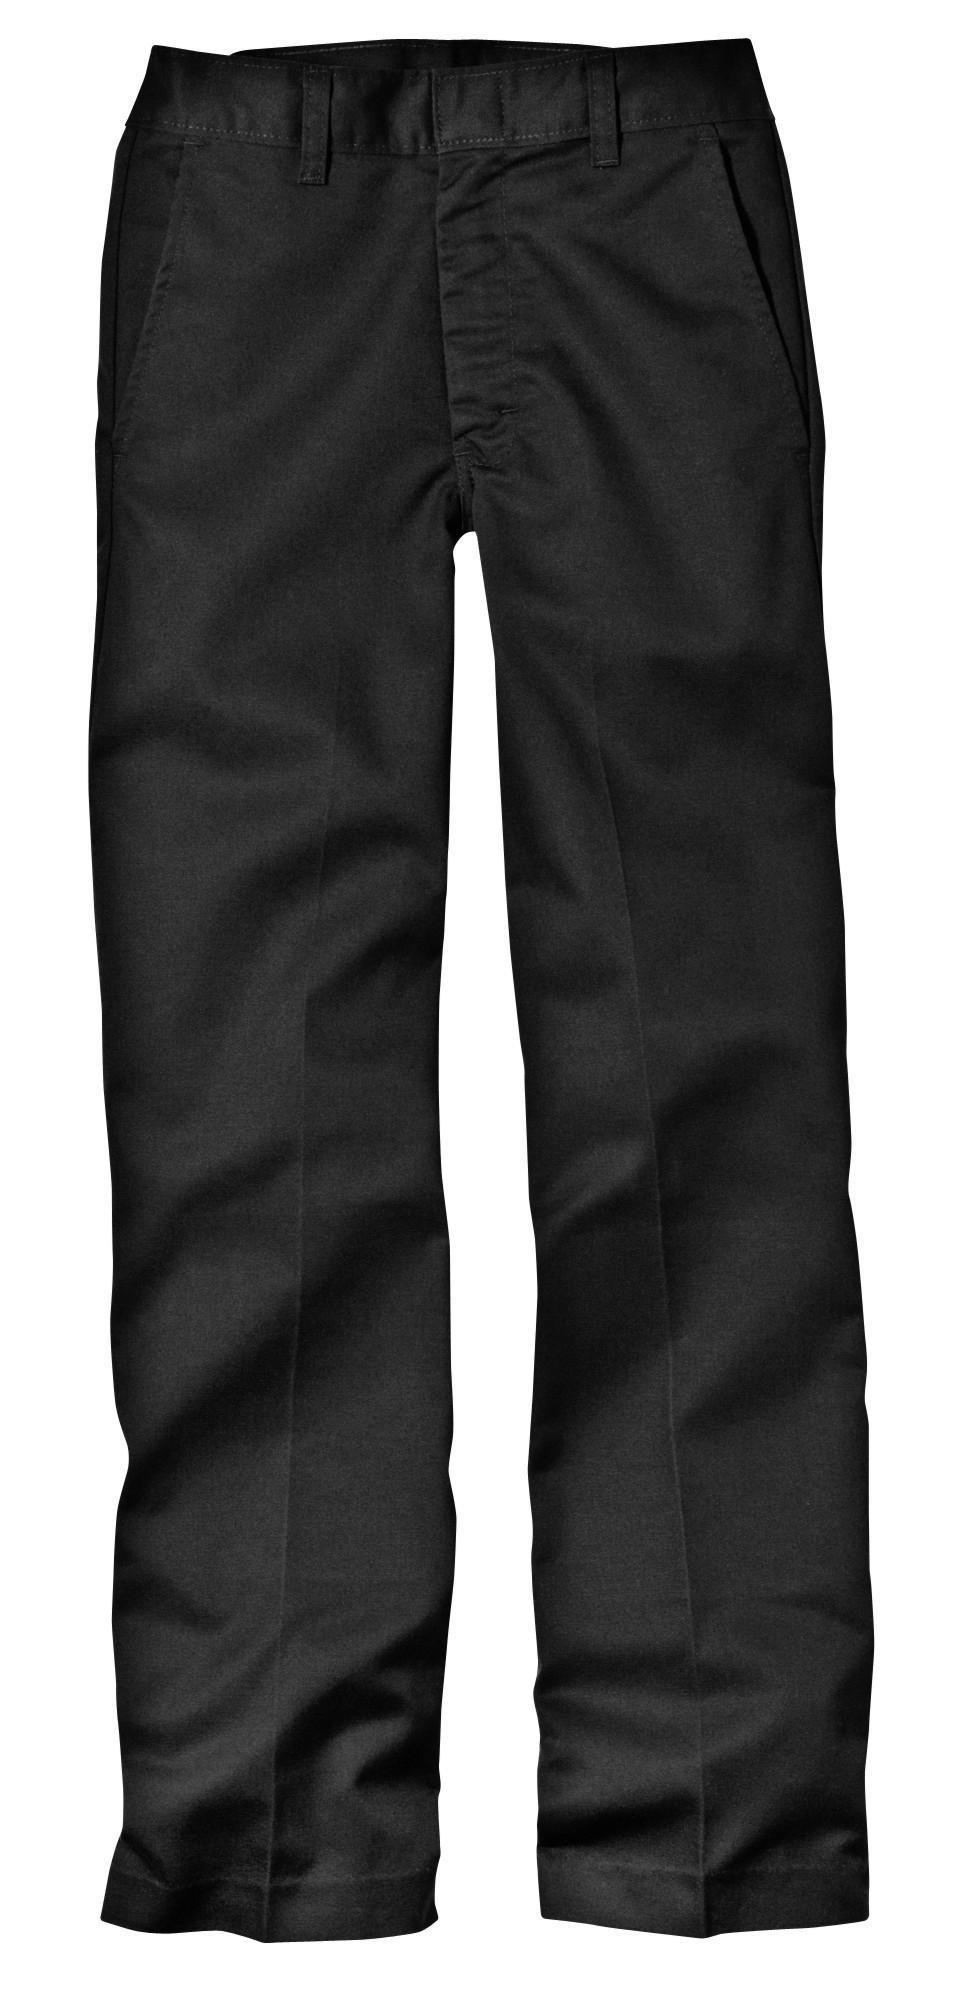 Dickies Husky Boys Flat Front Pant, Black, 20 Husky / 35.5'' x 31'' by dickies